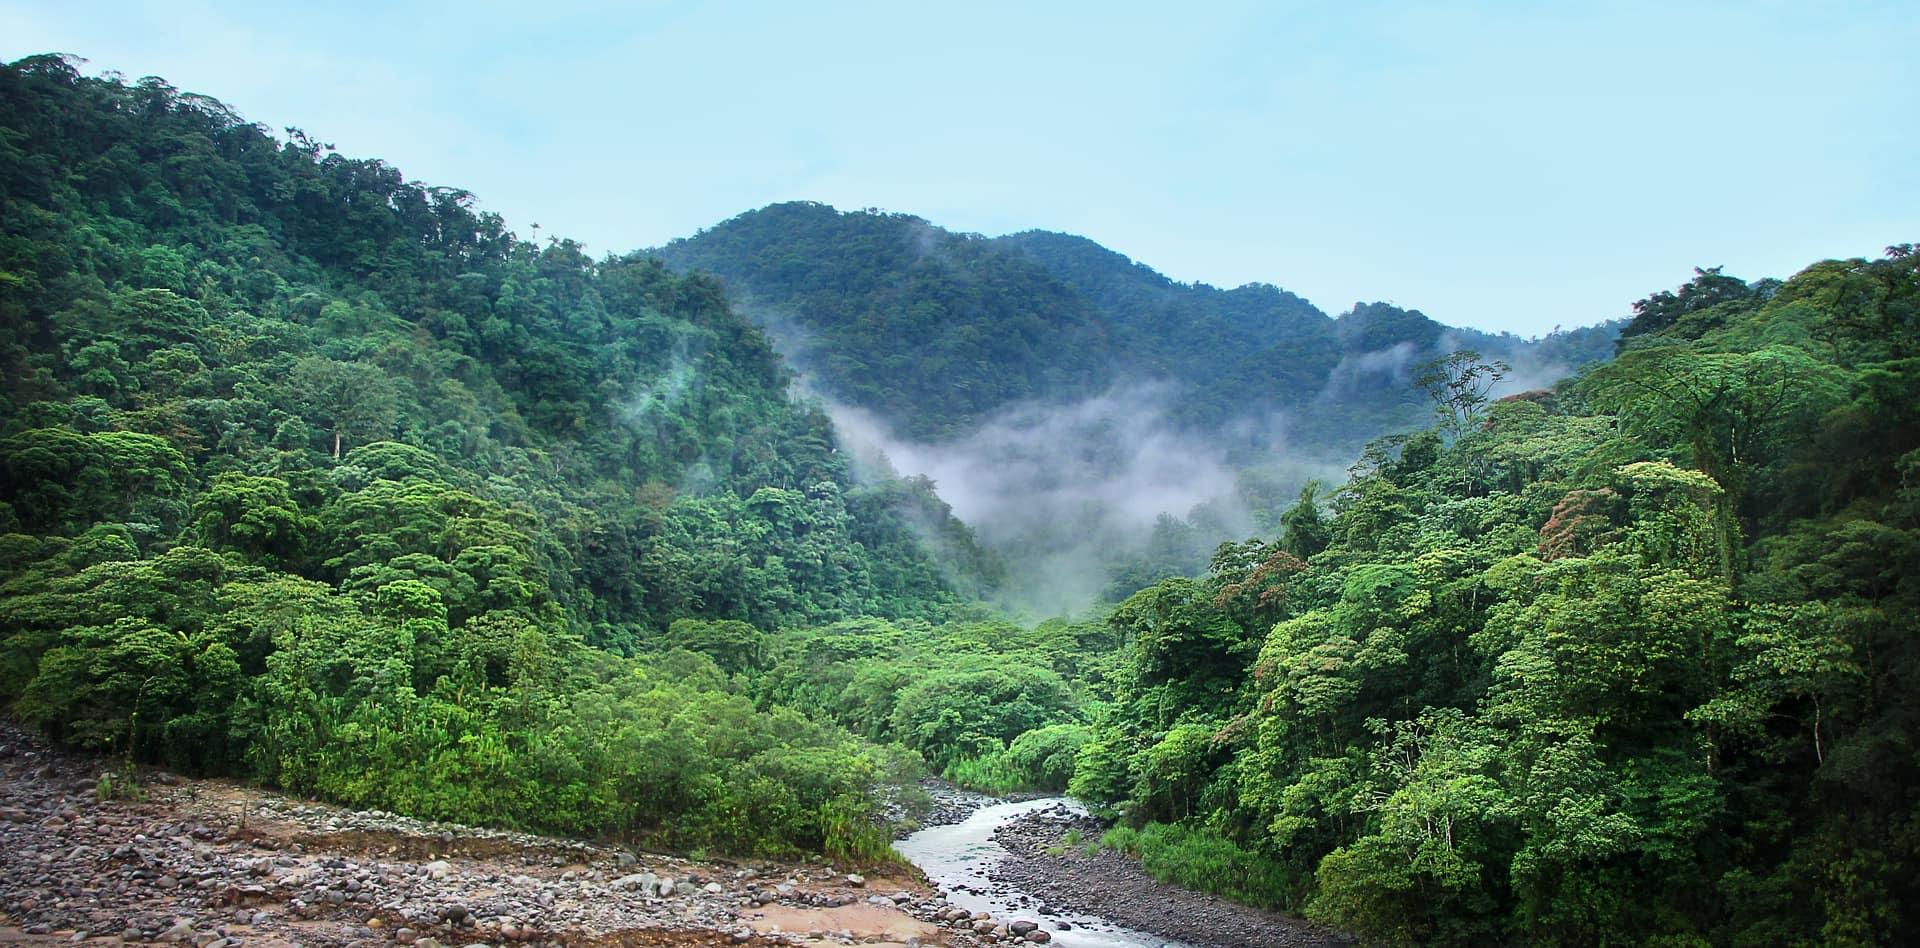 patrimoine-de-lhumanite-cover-costa-rica-decouverte